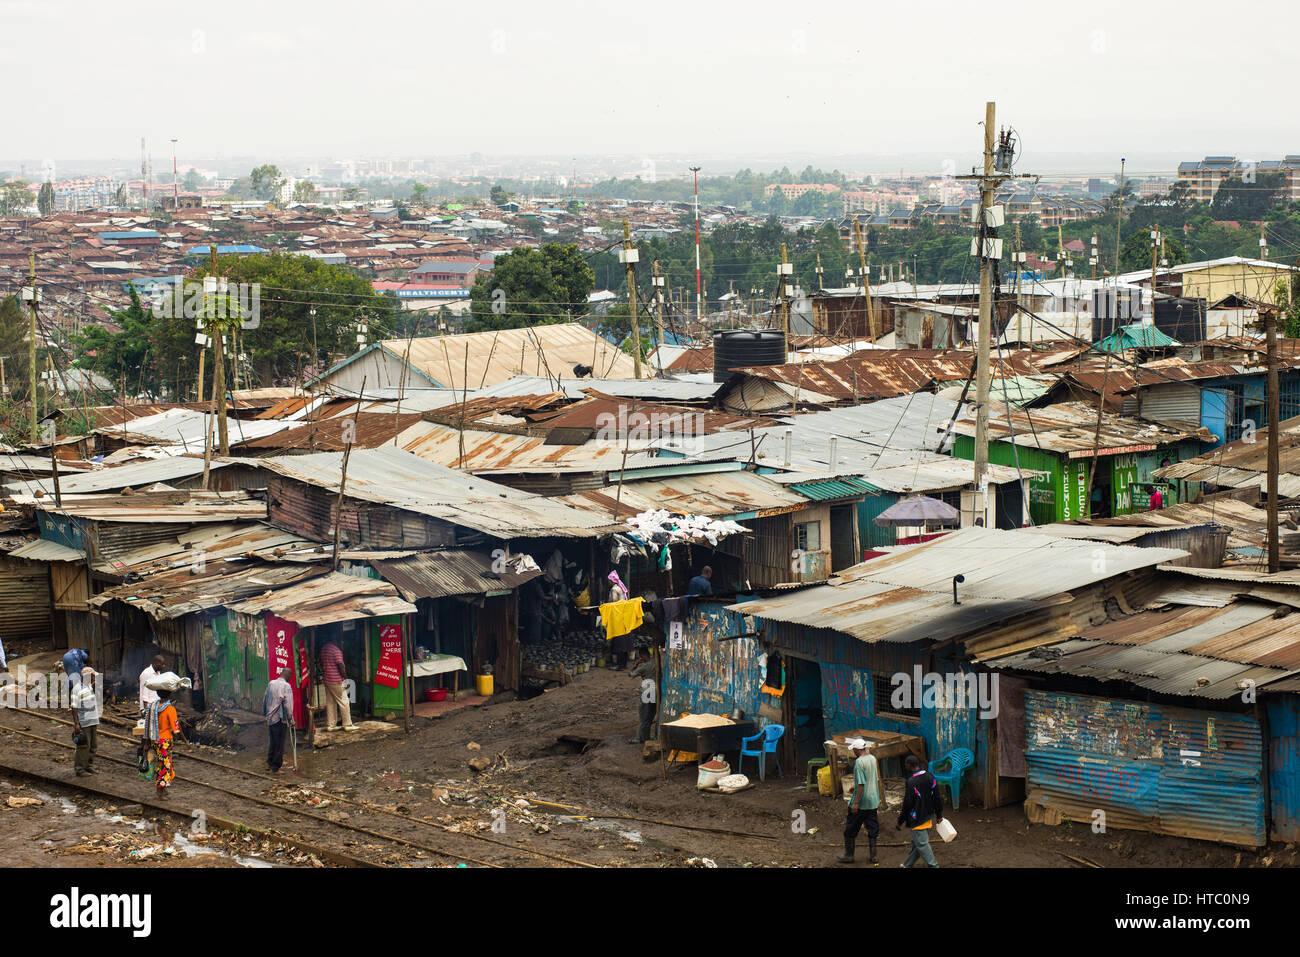 inhabitants-of-kibera-slum-going-about-d